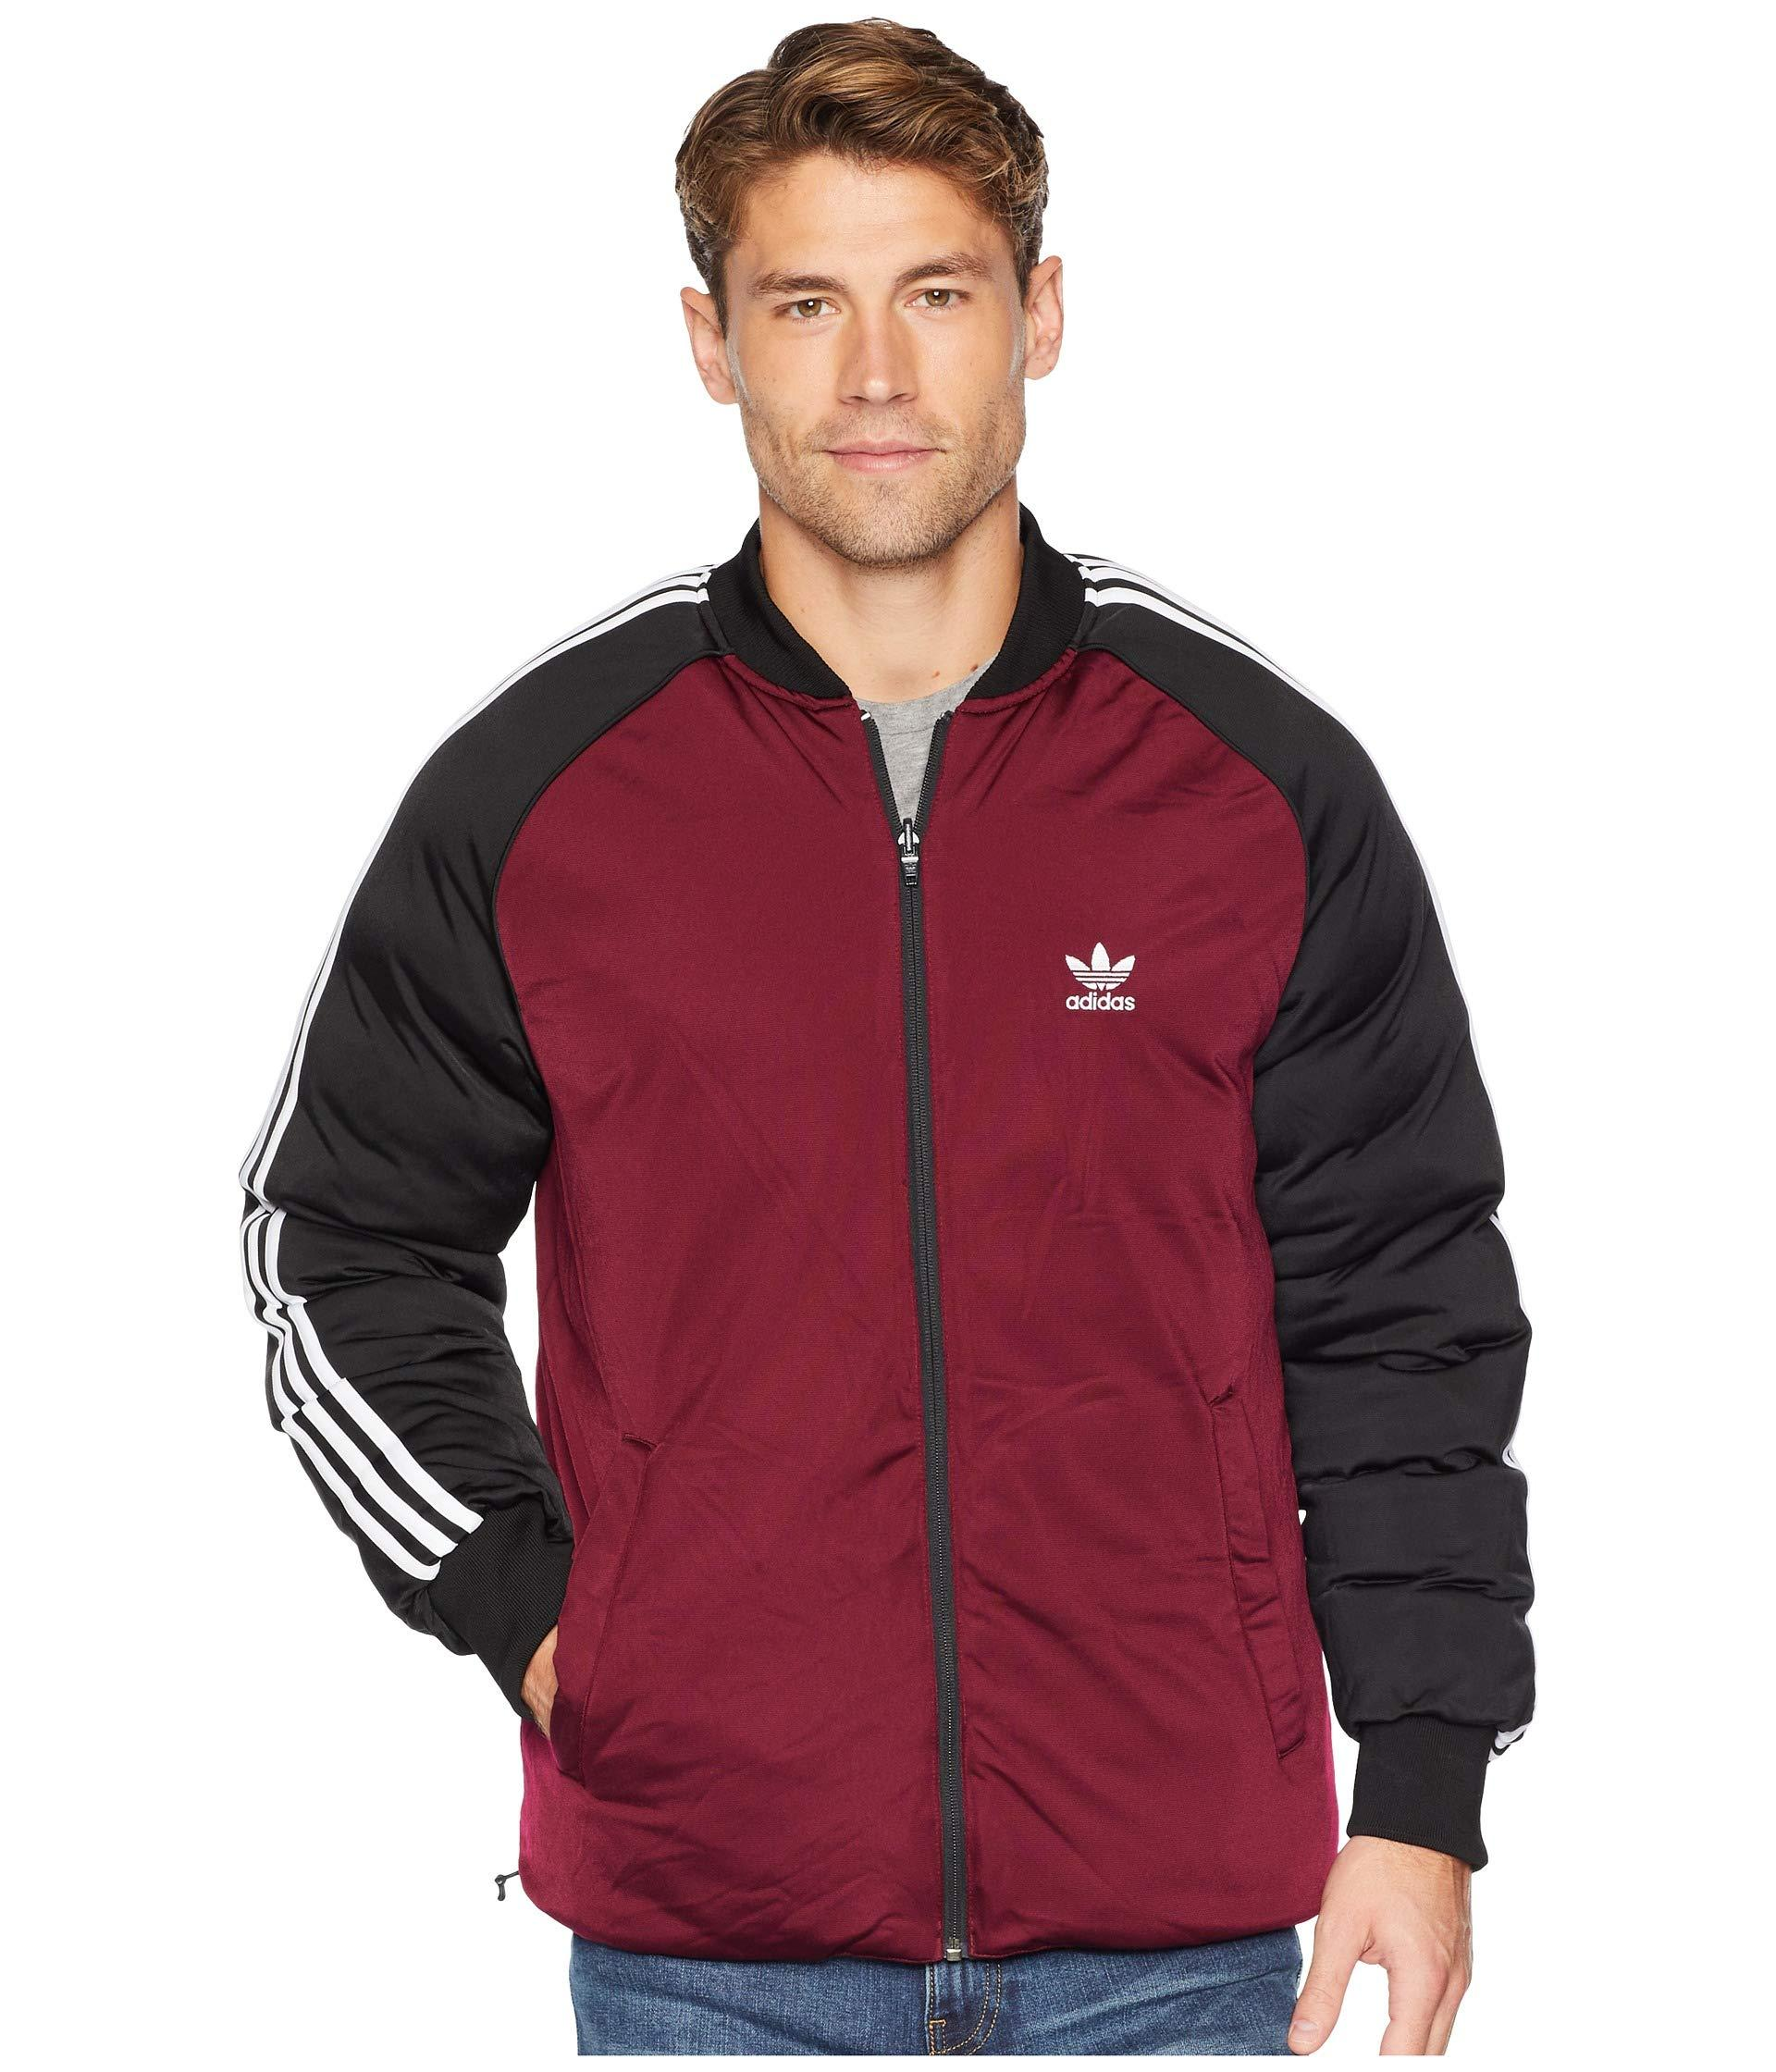 6988f00528c4 Lyst - adidas Originals Superstar Reversible Track Jacket in Black ...